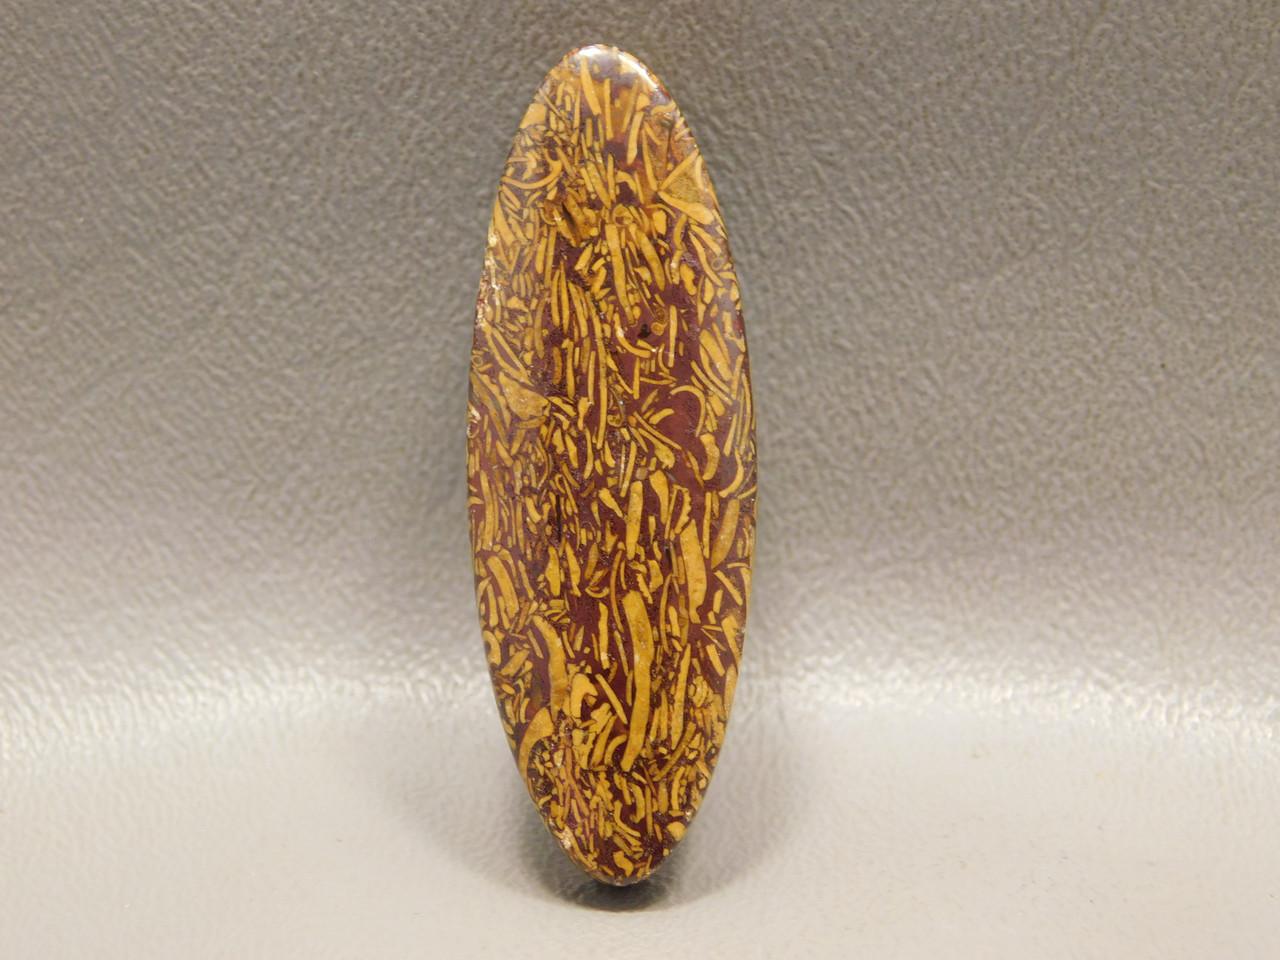 Coquina Jasper (Script Stone) Bead Pendant #1